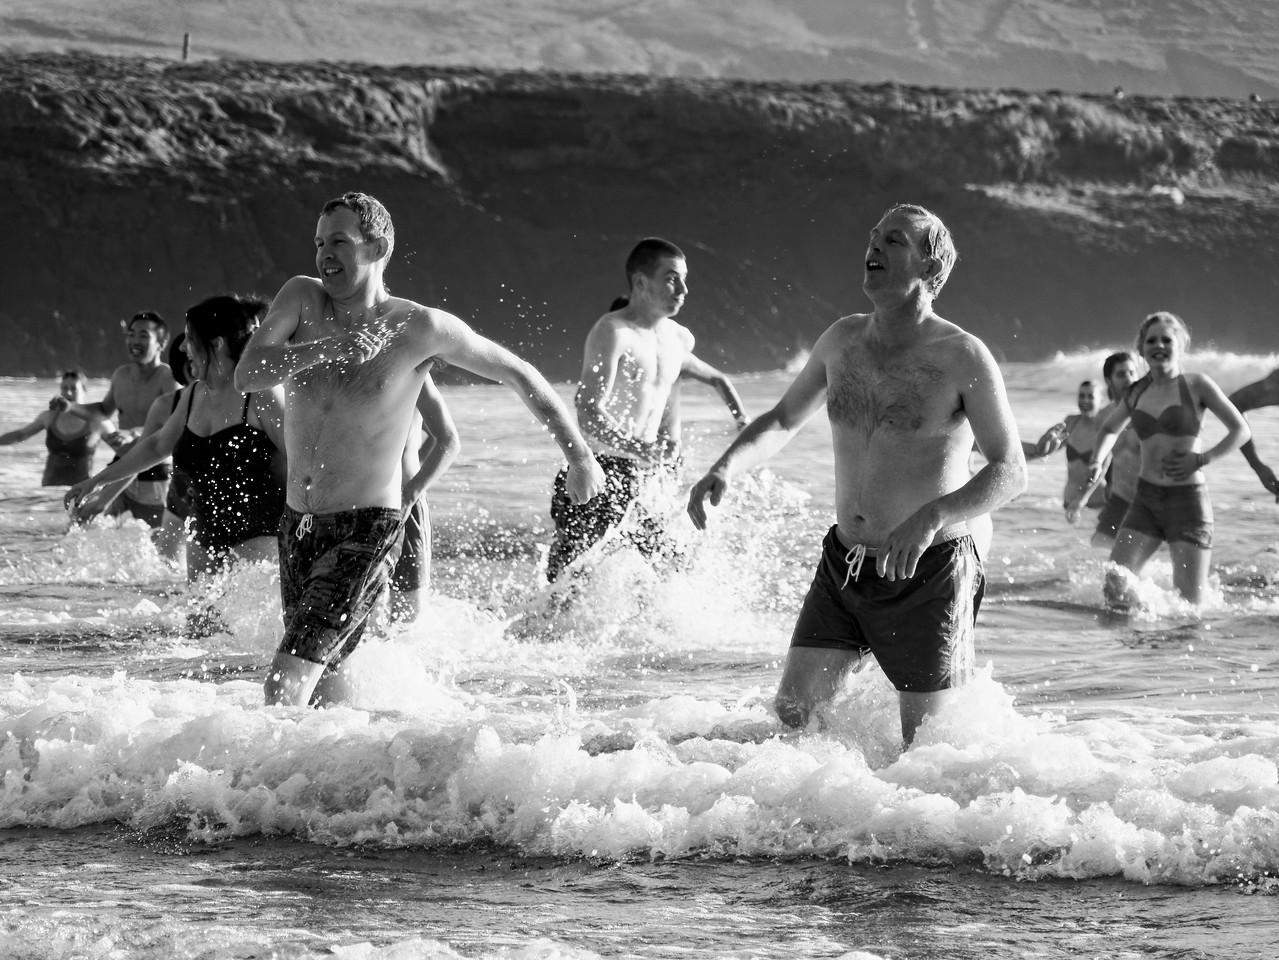 Christmas 2013 Swim in the Dingle Peninsula